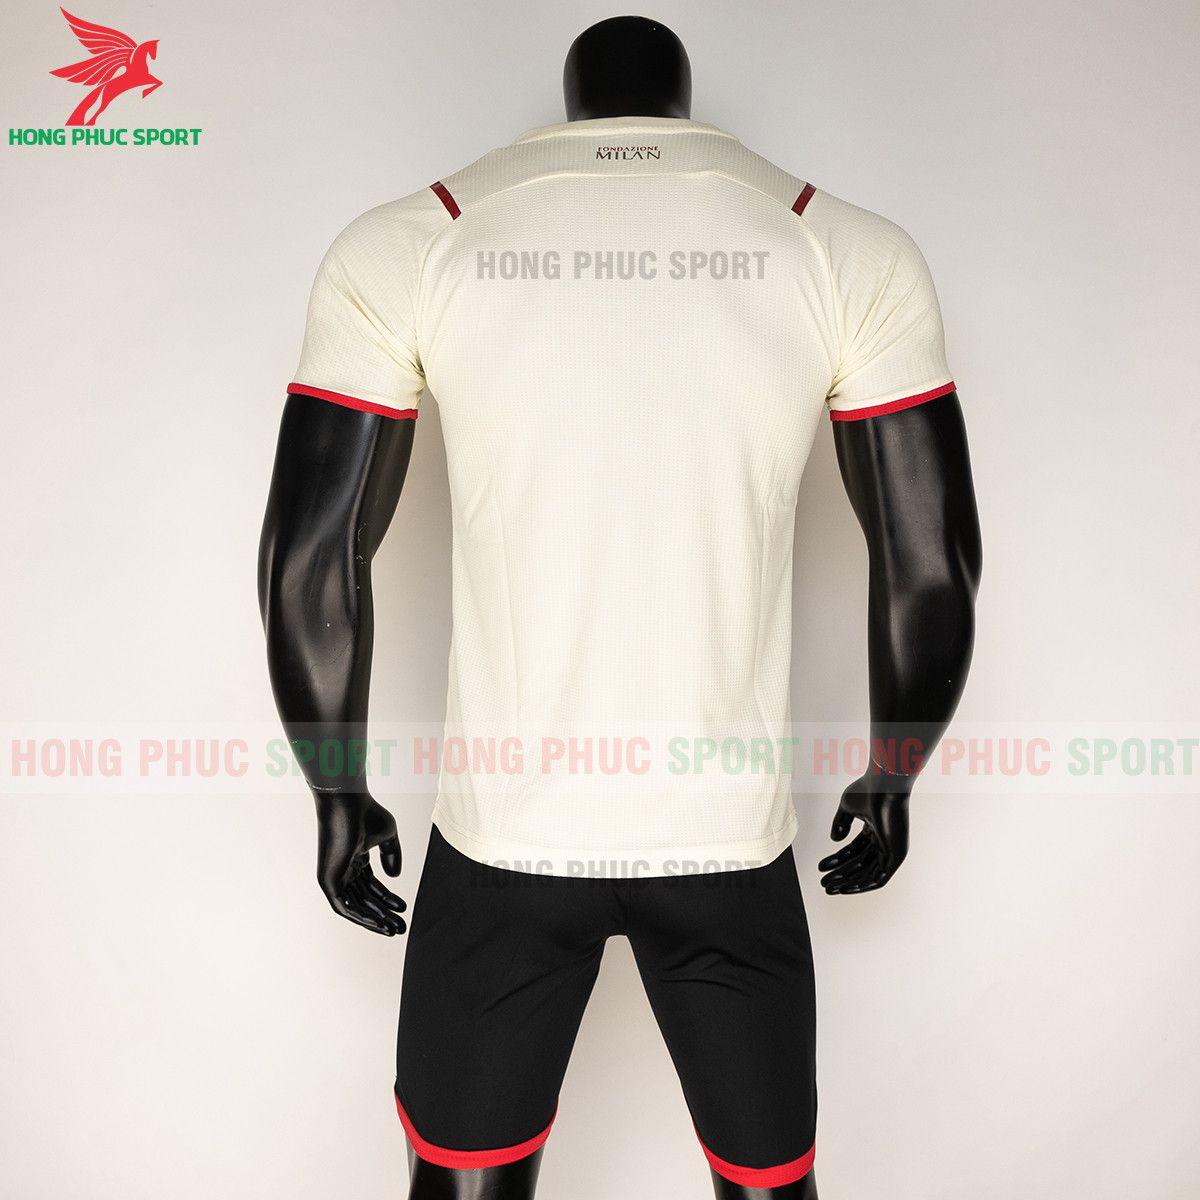 https://cdn.hongphucsport.com/unsafe/s4.shopbay.vn/files/285/ao-bong-da-ac-milan-2021-22-san-khach-thailand-615593f220ad1.jpg